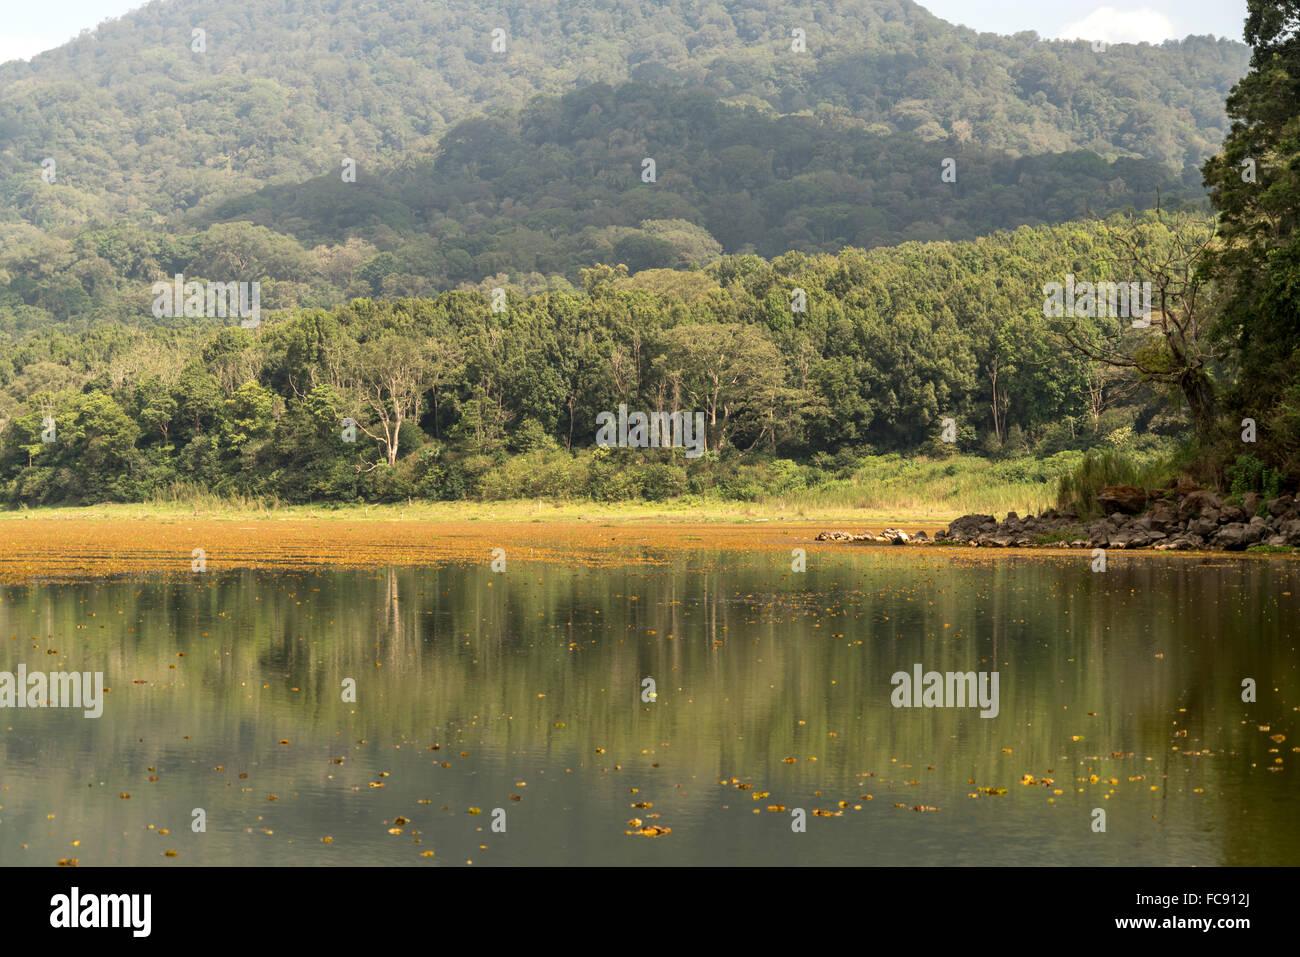 Forest and  Lake Buyan near Bedugul, Bali, Indonesia - Stock Image